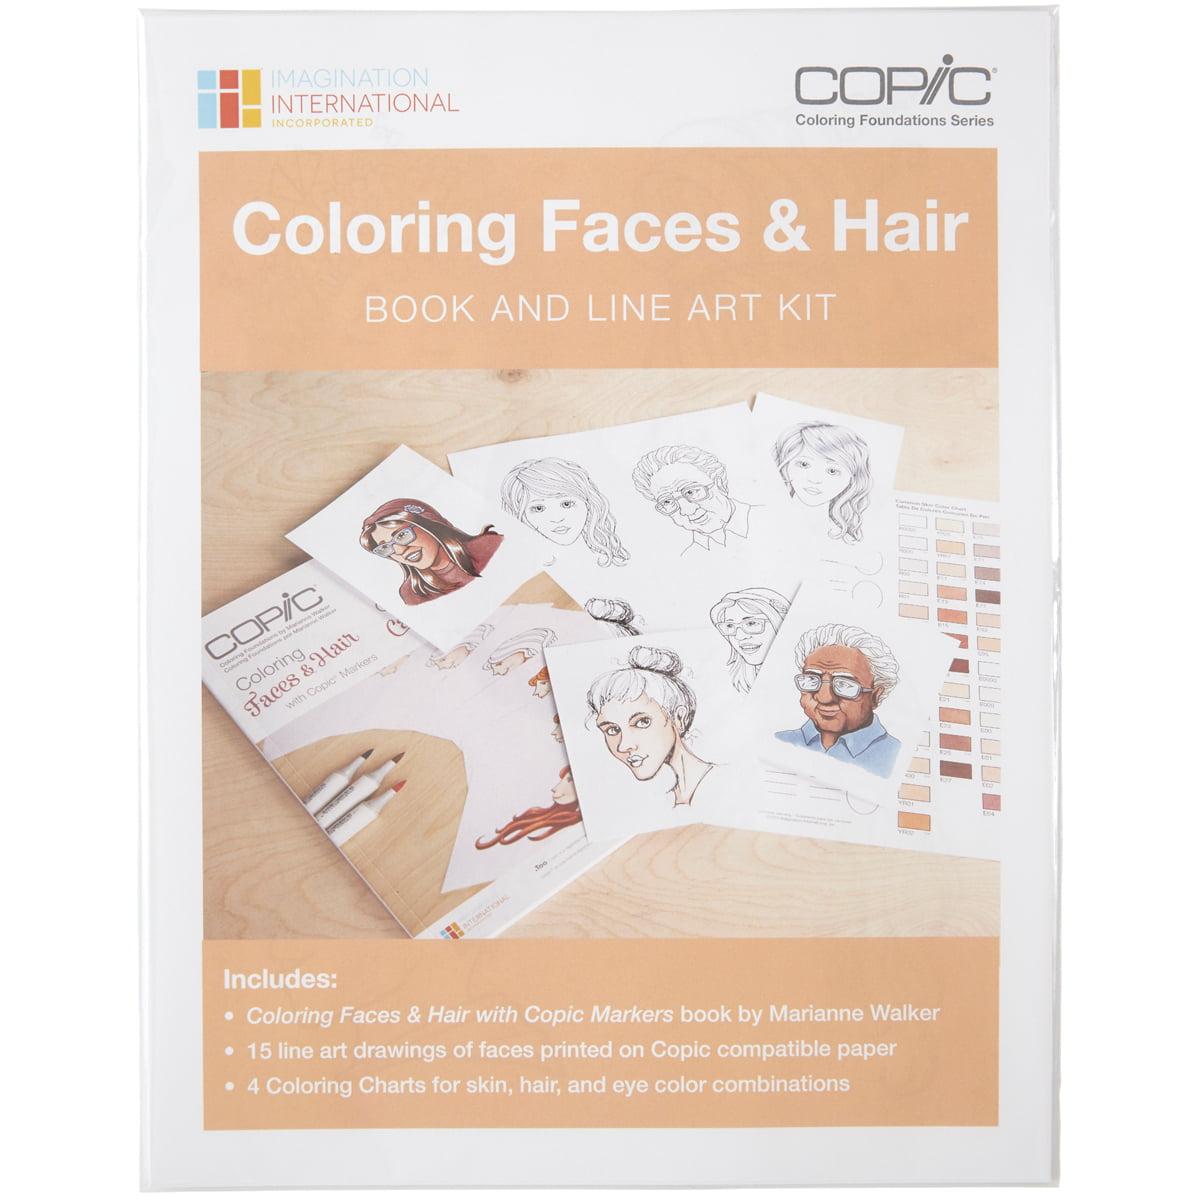 Copic Coloring Faces Book & Line Art Kit - Walmart.com